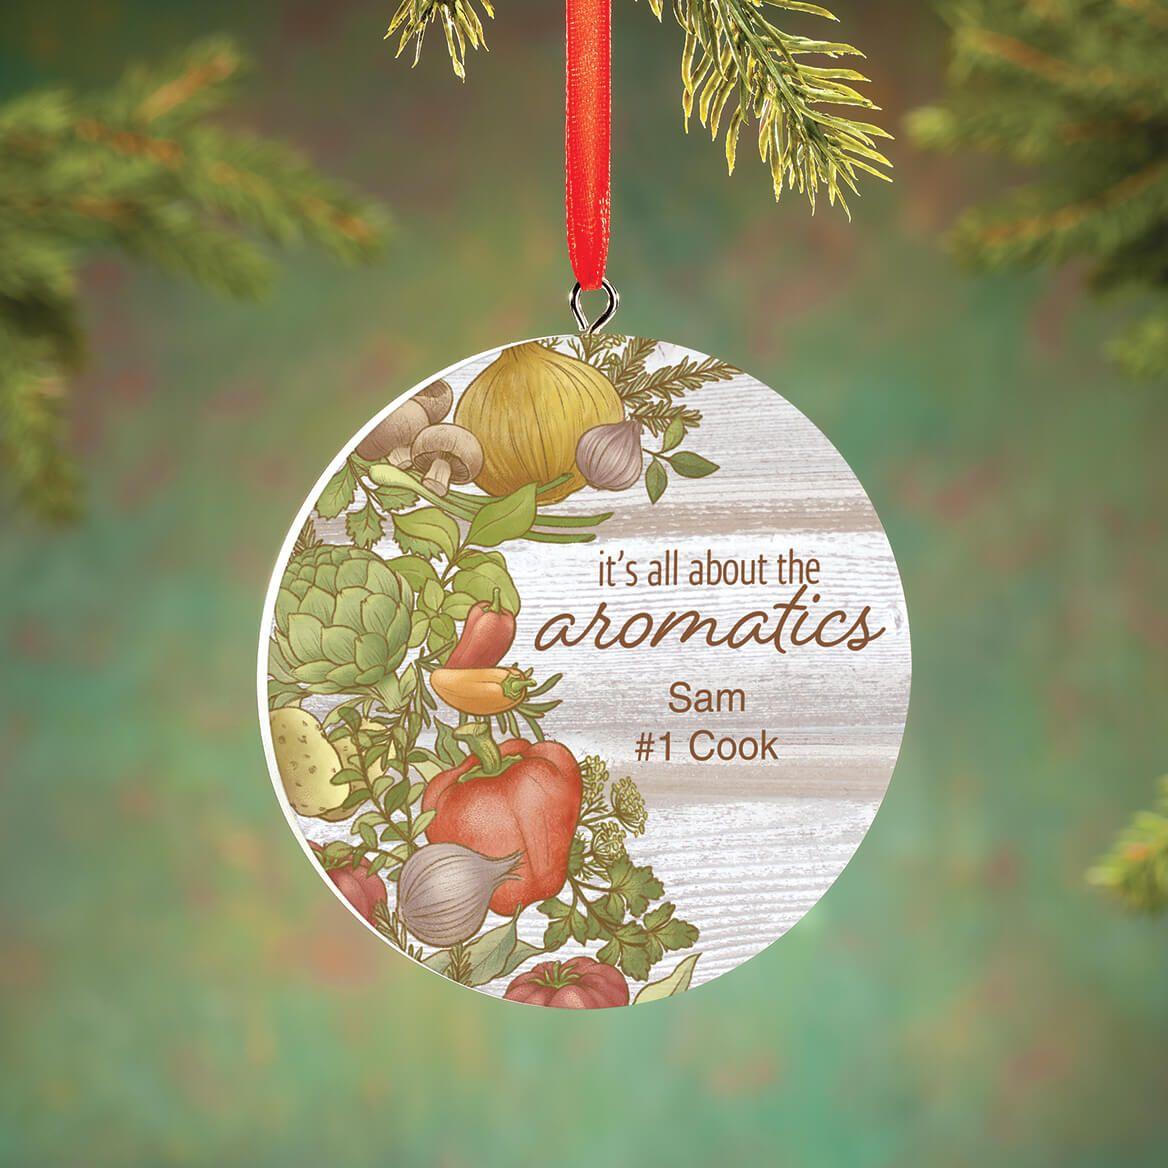 Personalized Aromatics Ornament-372869